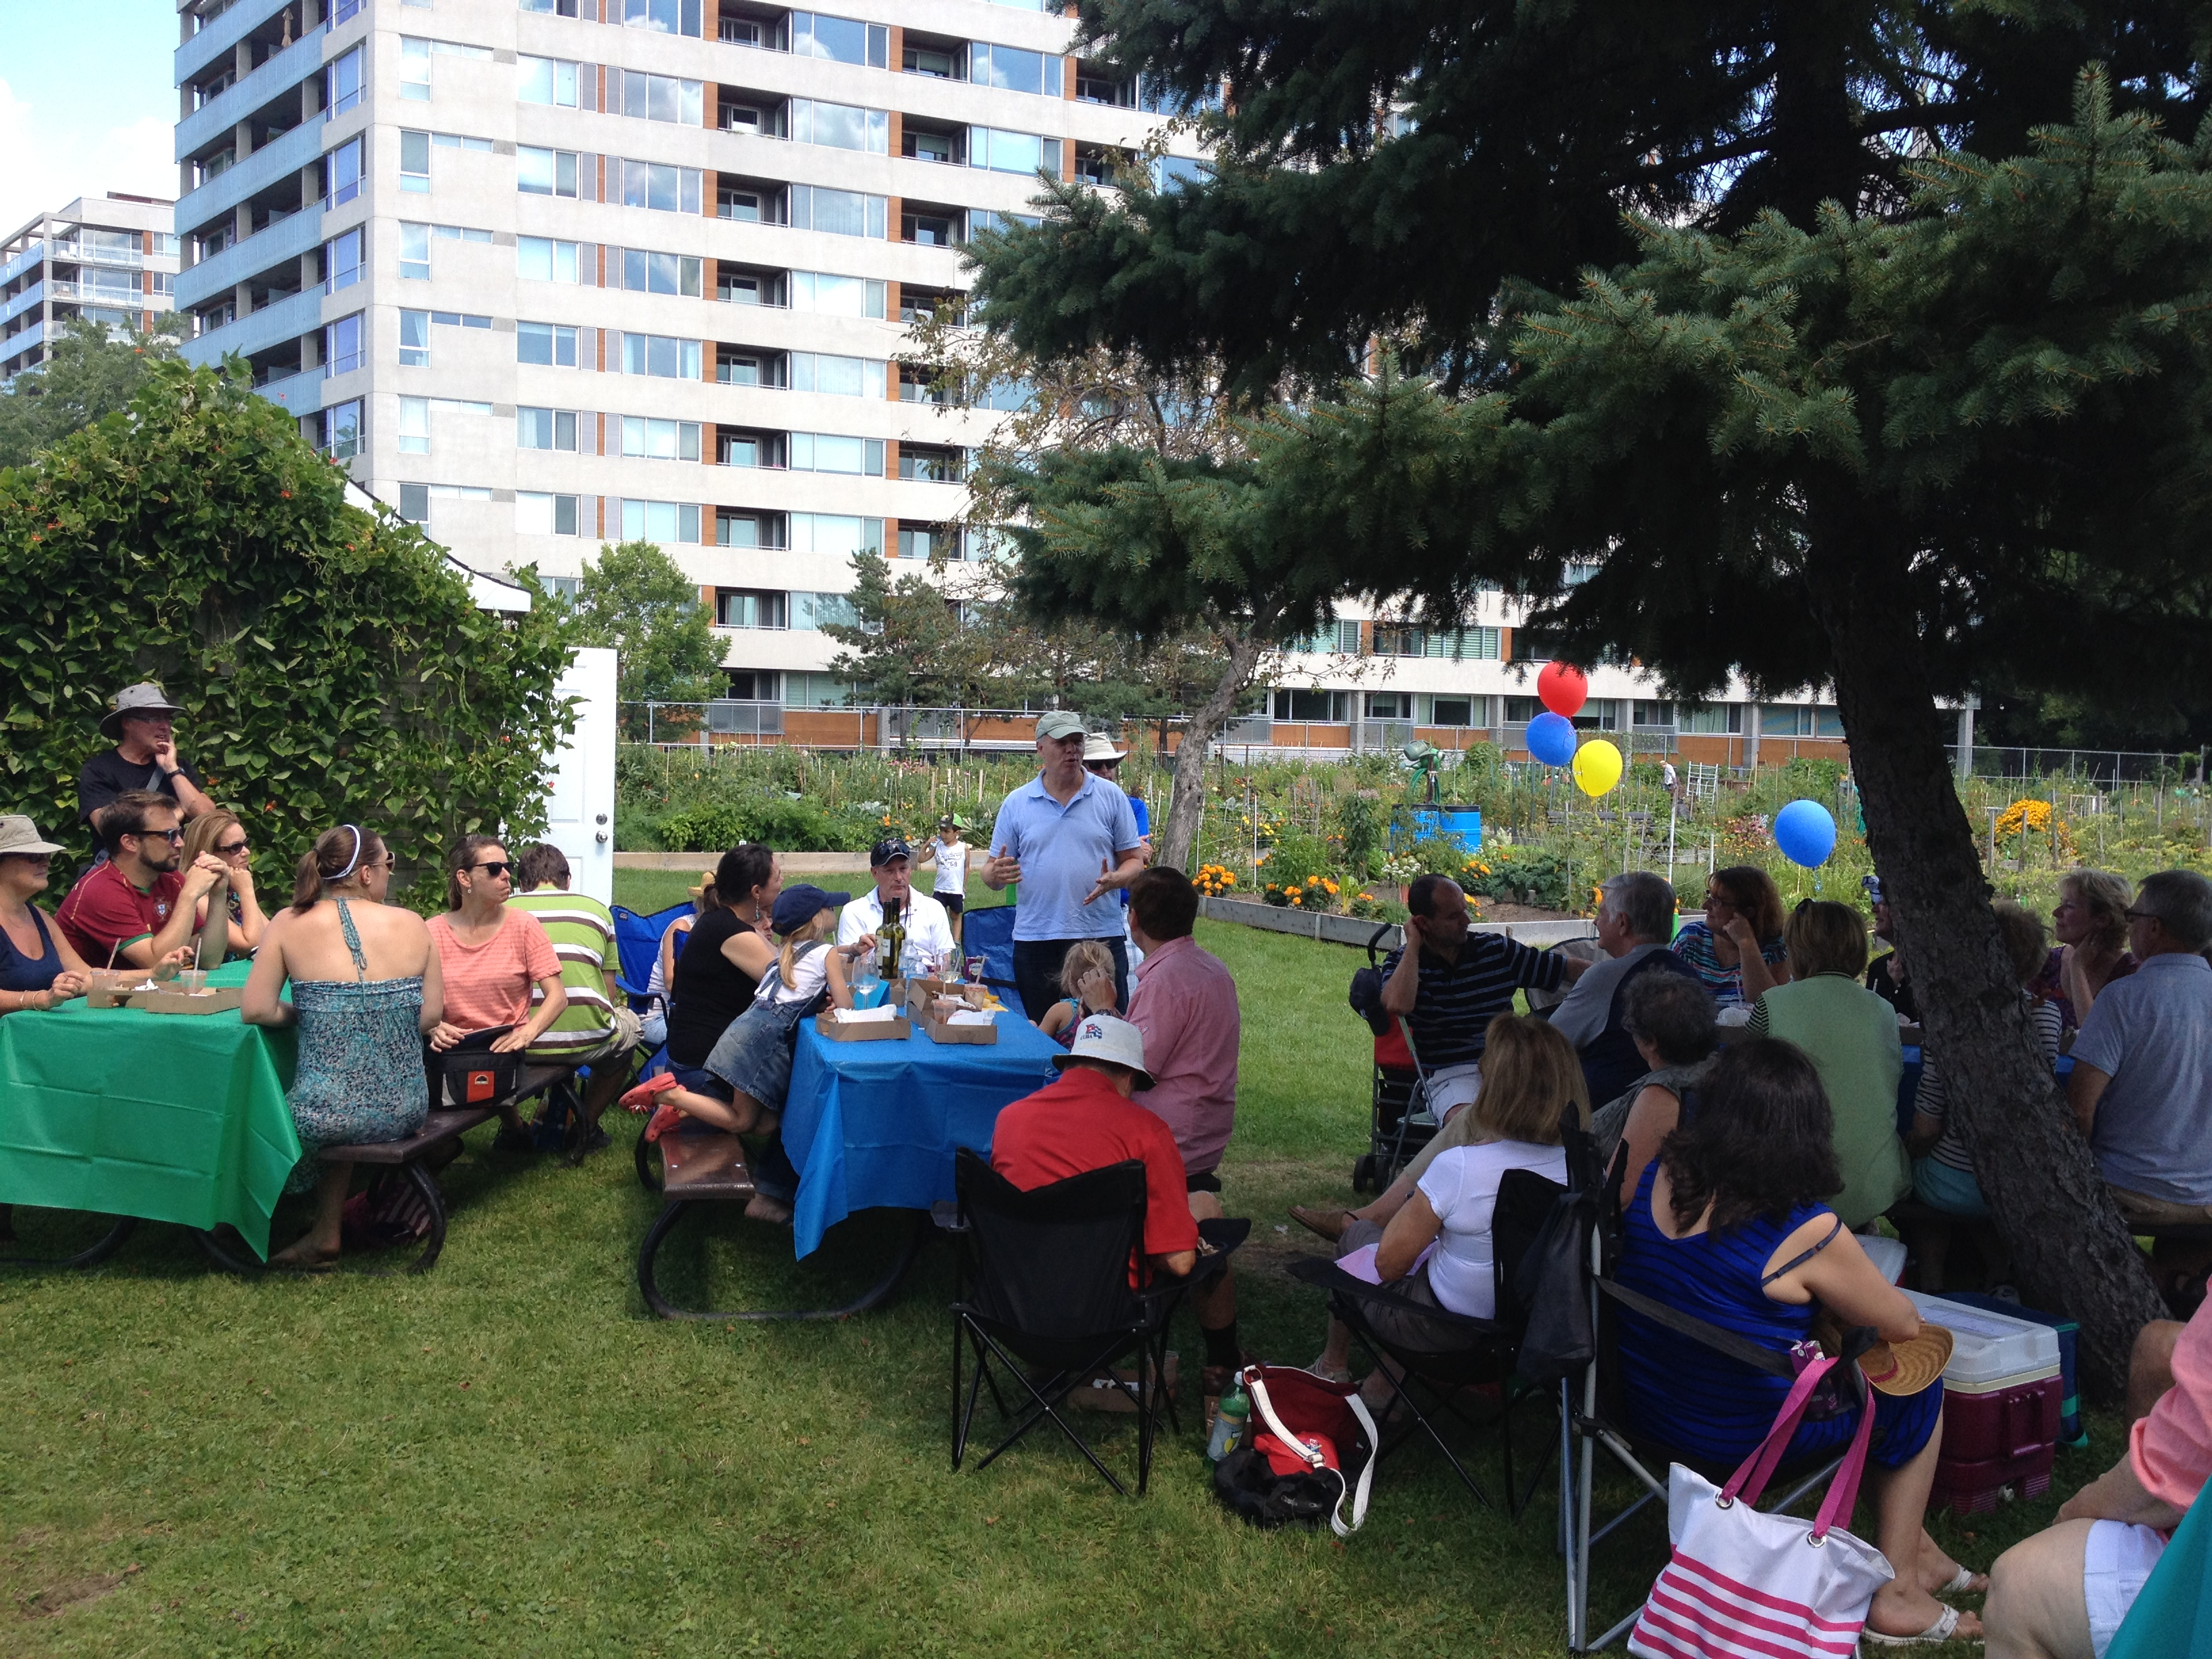 2015-08-23 jardin pré carré